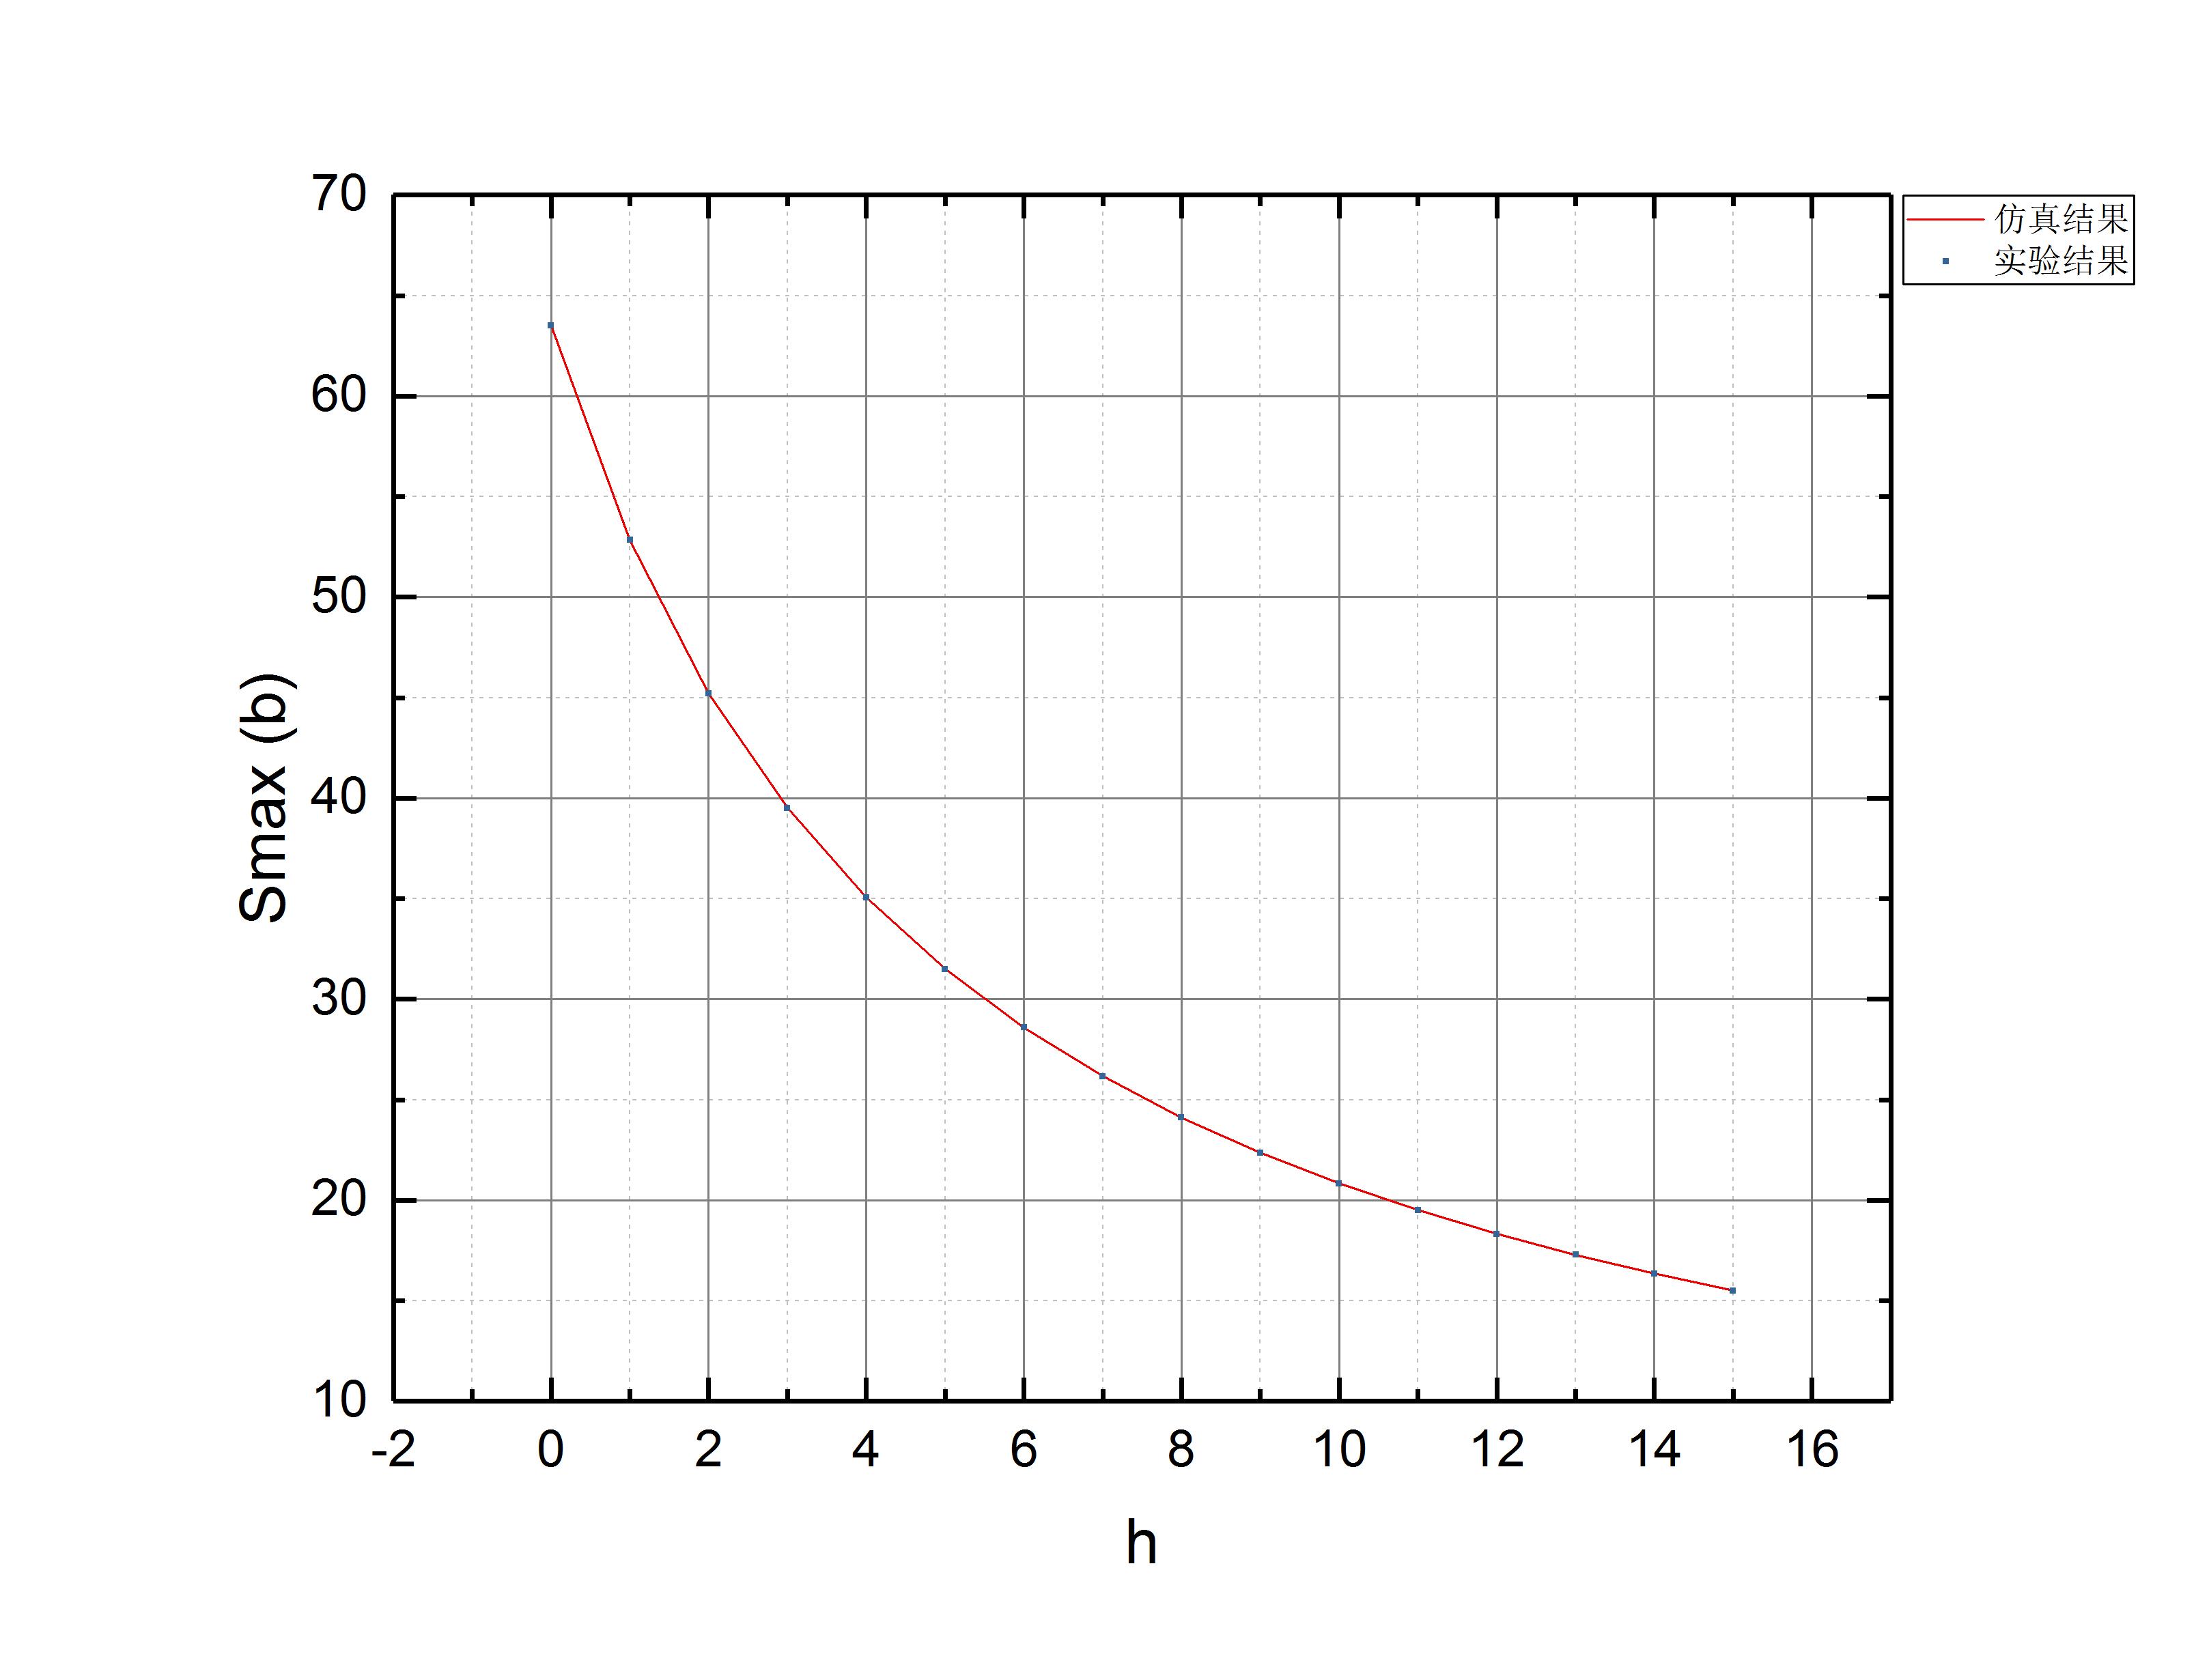 C:UsersTRDesktopS-Smax¶Ô±È.opj/S-Smax¶Ô±È/Folder1//Graph4